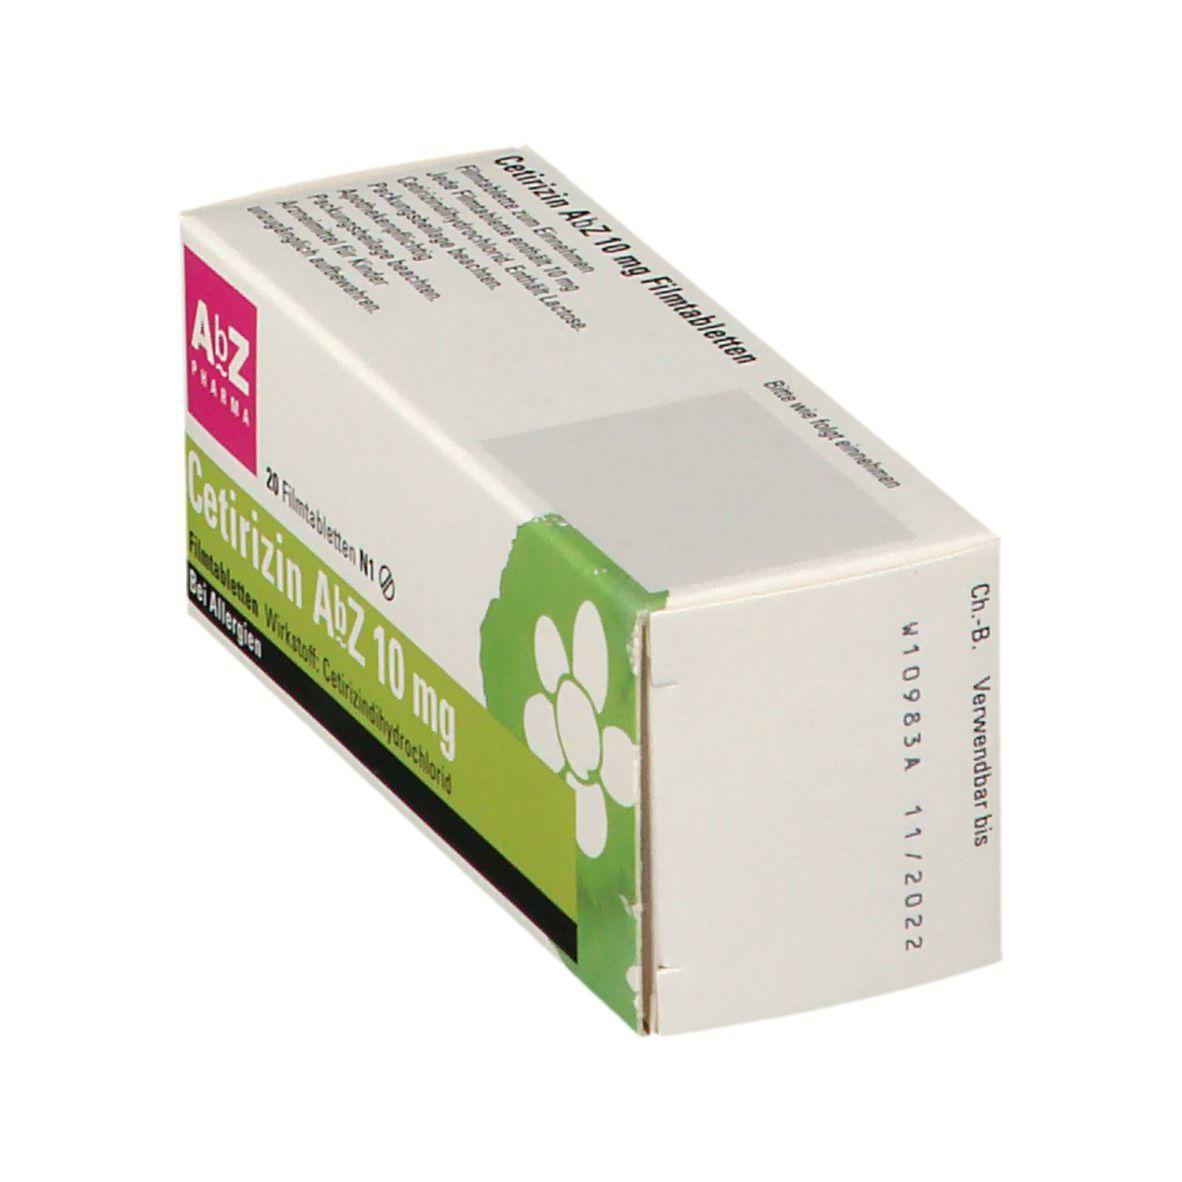 Cetirizin AbZ 10 mg 20 St - shop-apotheke.com